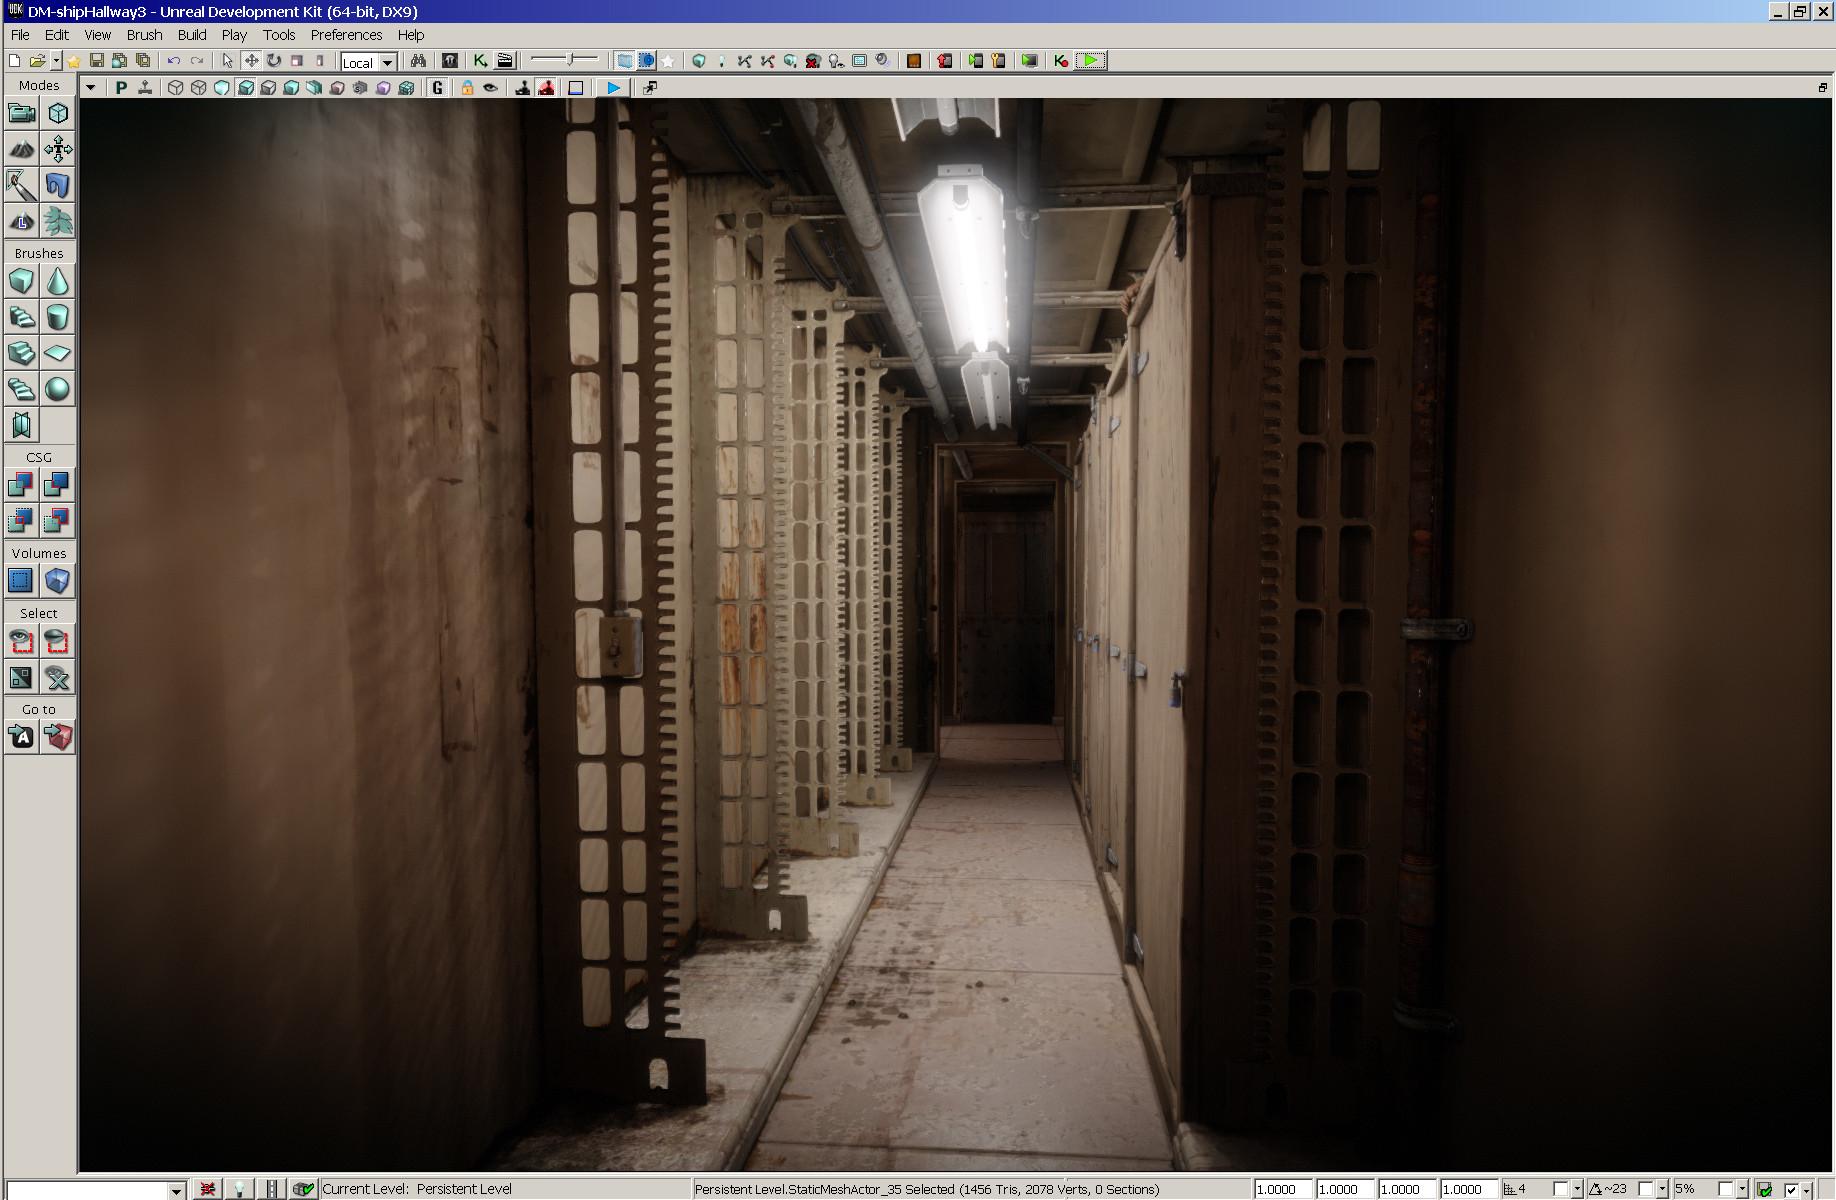 Francisco cruz hallway 13